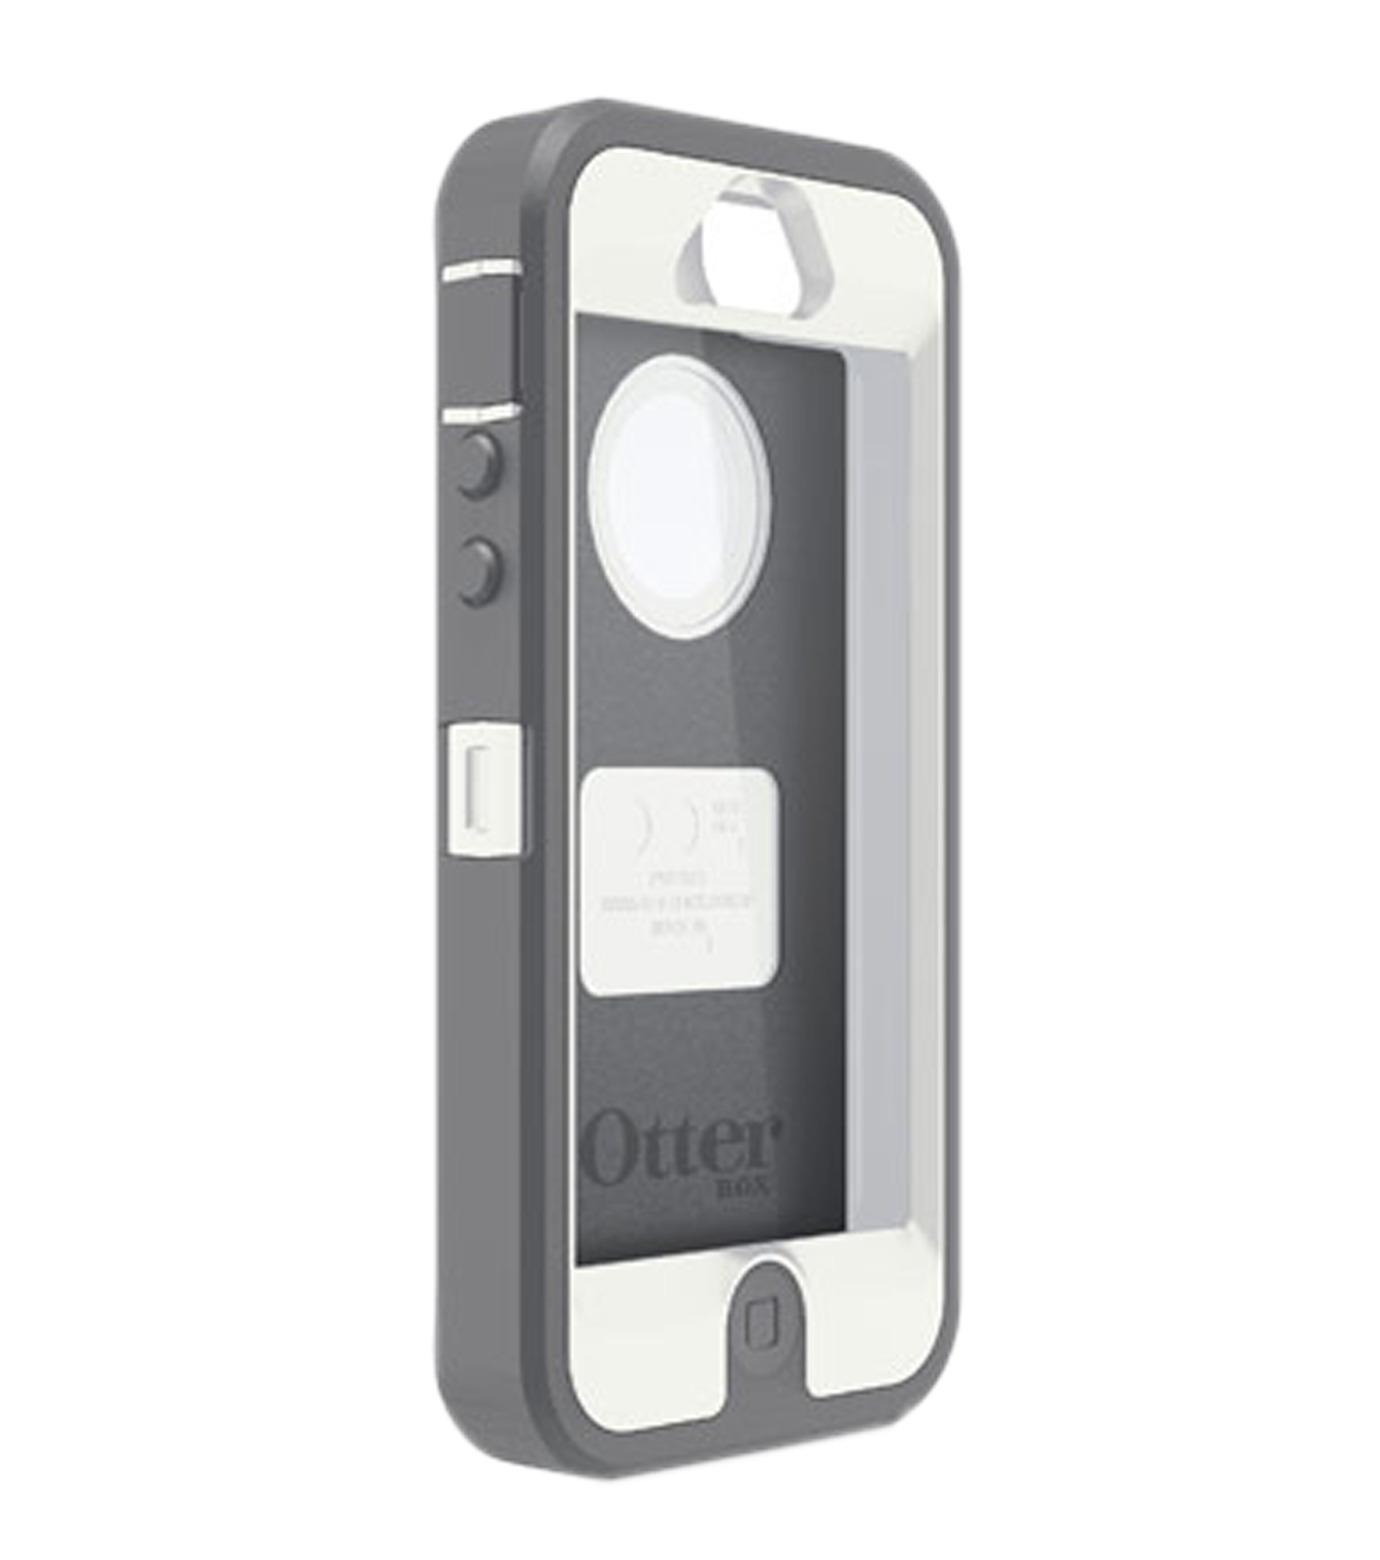 Tunewear(チューンウエア)のiPhone5 Case-GRAY-OTB-PH-013-11 拡大詳細画像2